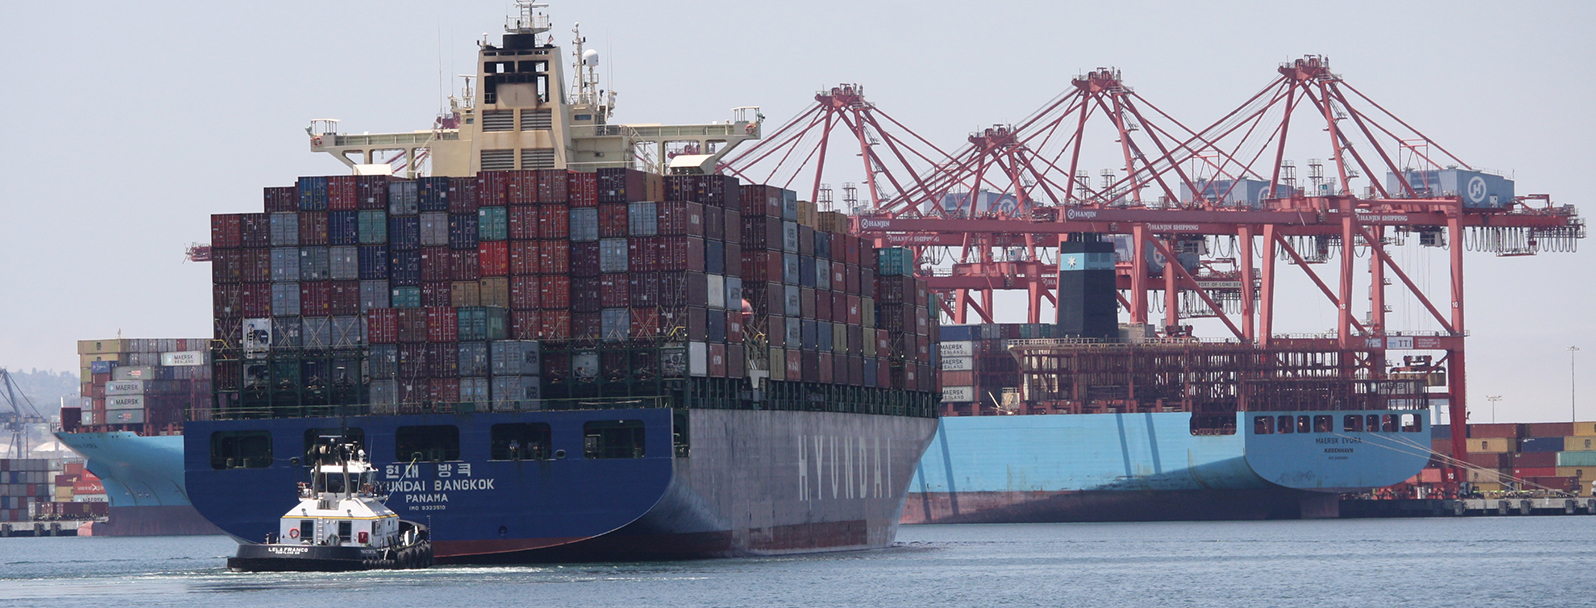 Vessel entering the port of Long Beach, California.